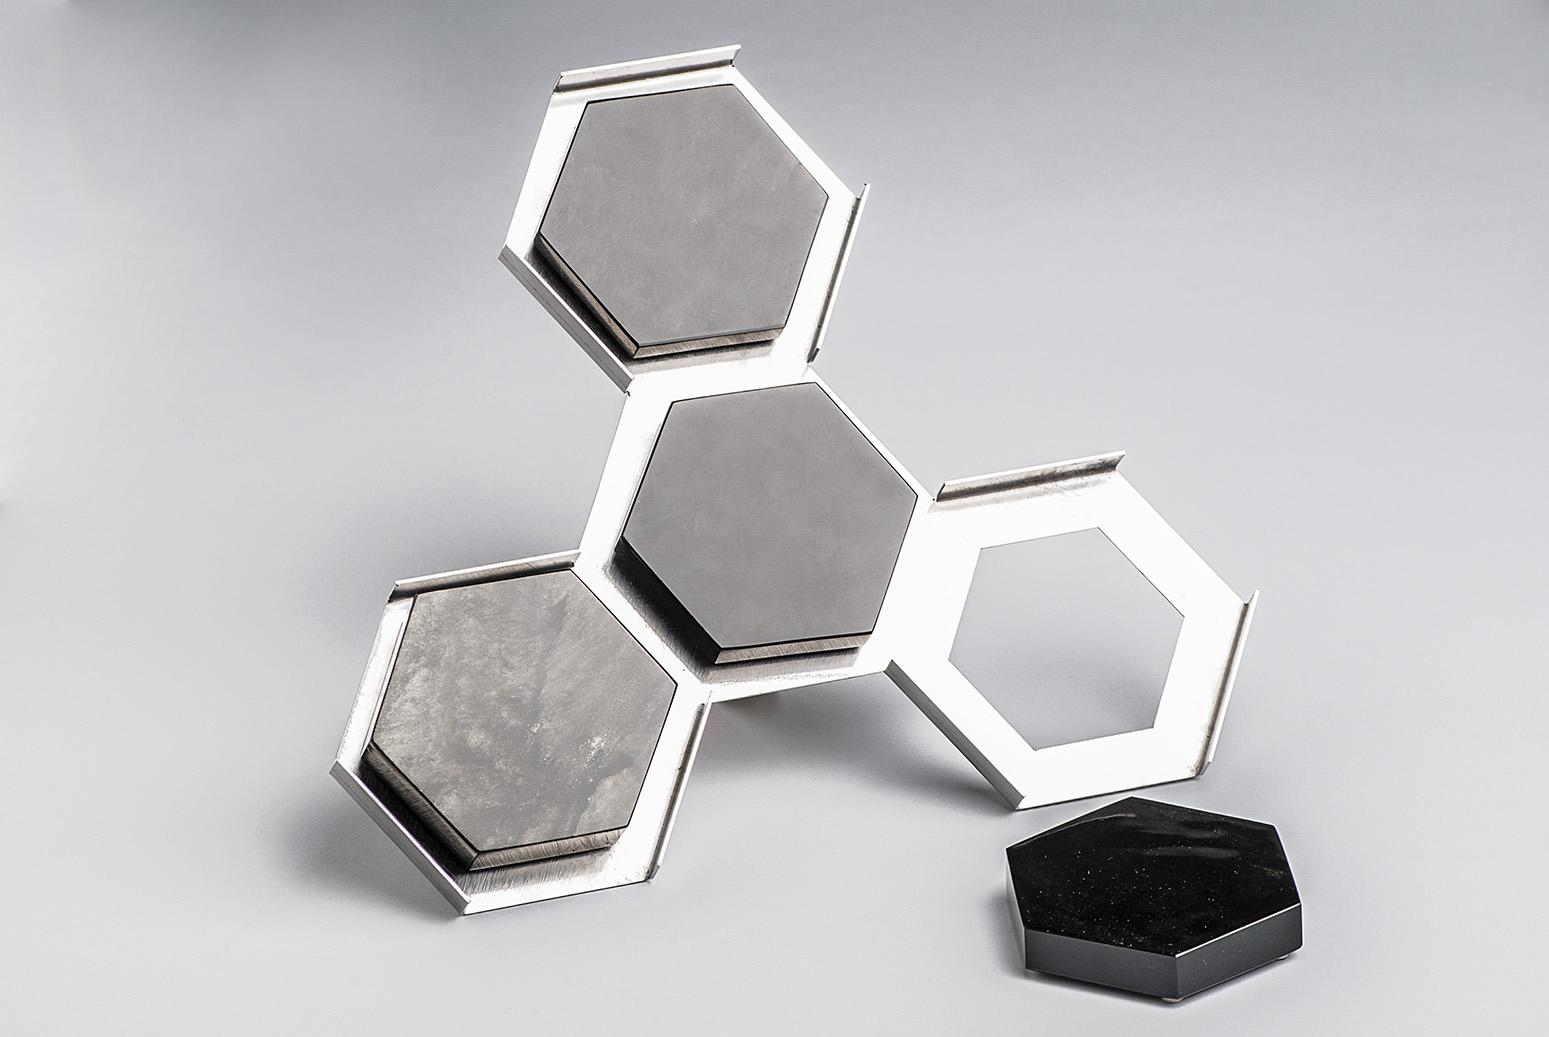 Obsidian-coasters-Isaac Cameo-artisan-Cristino Gómez-Gómez-Anahuac-MarionFriedmann-MexicoDesignTime8.jpg